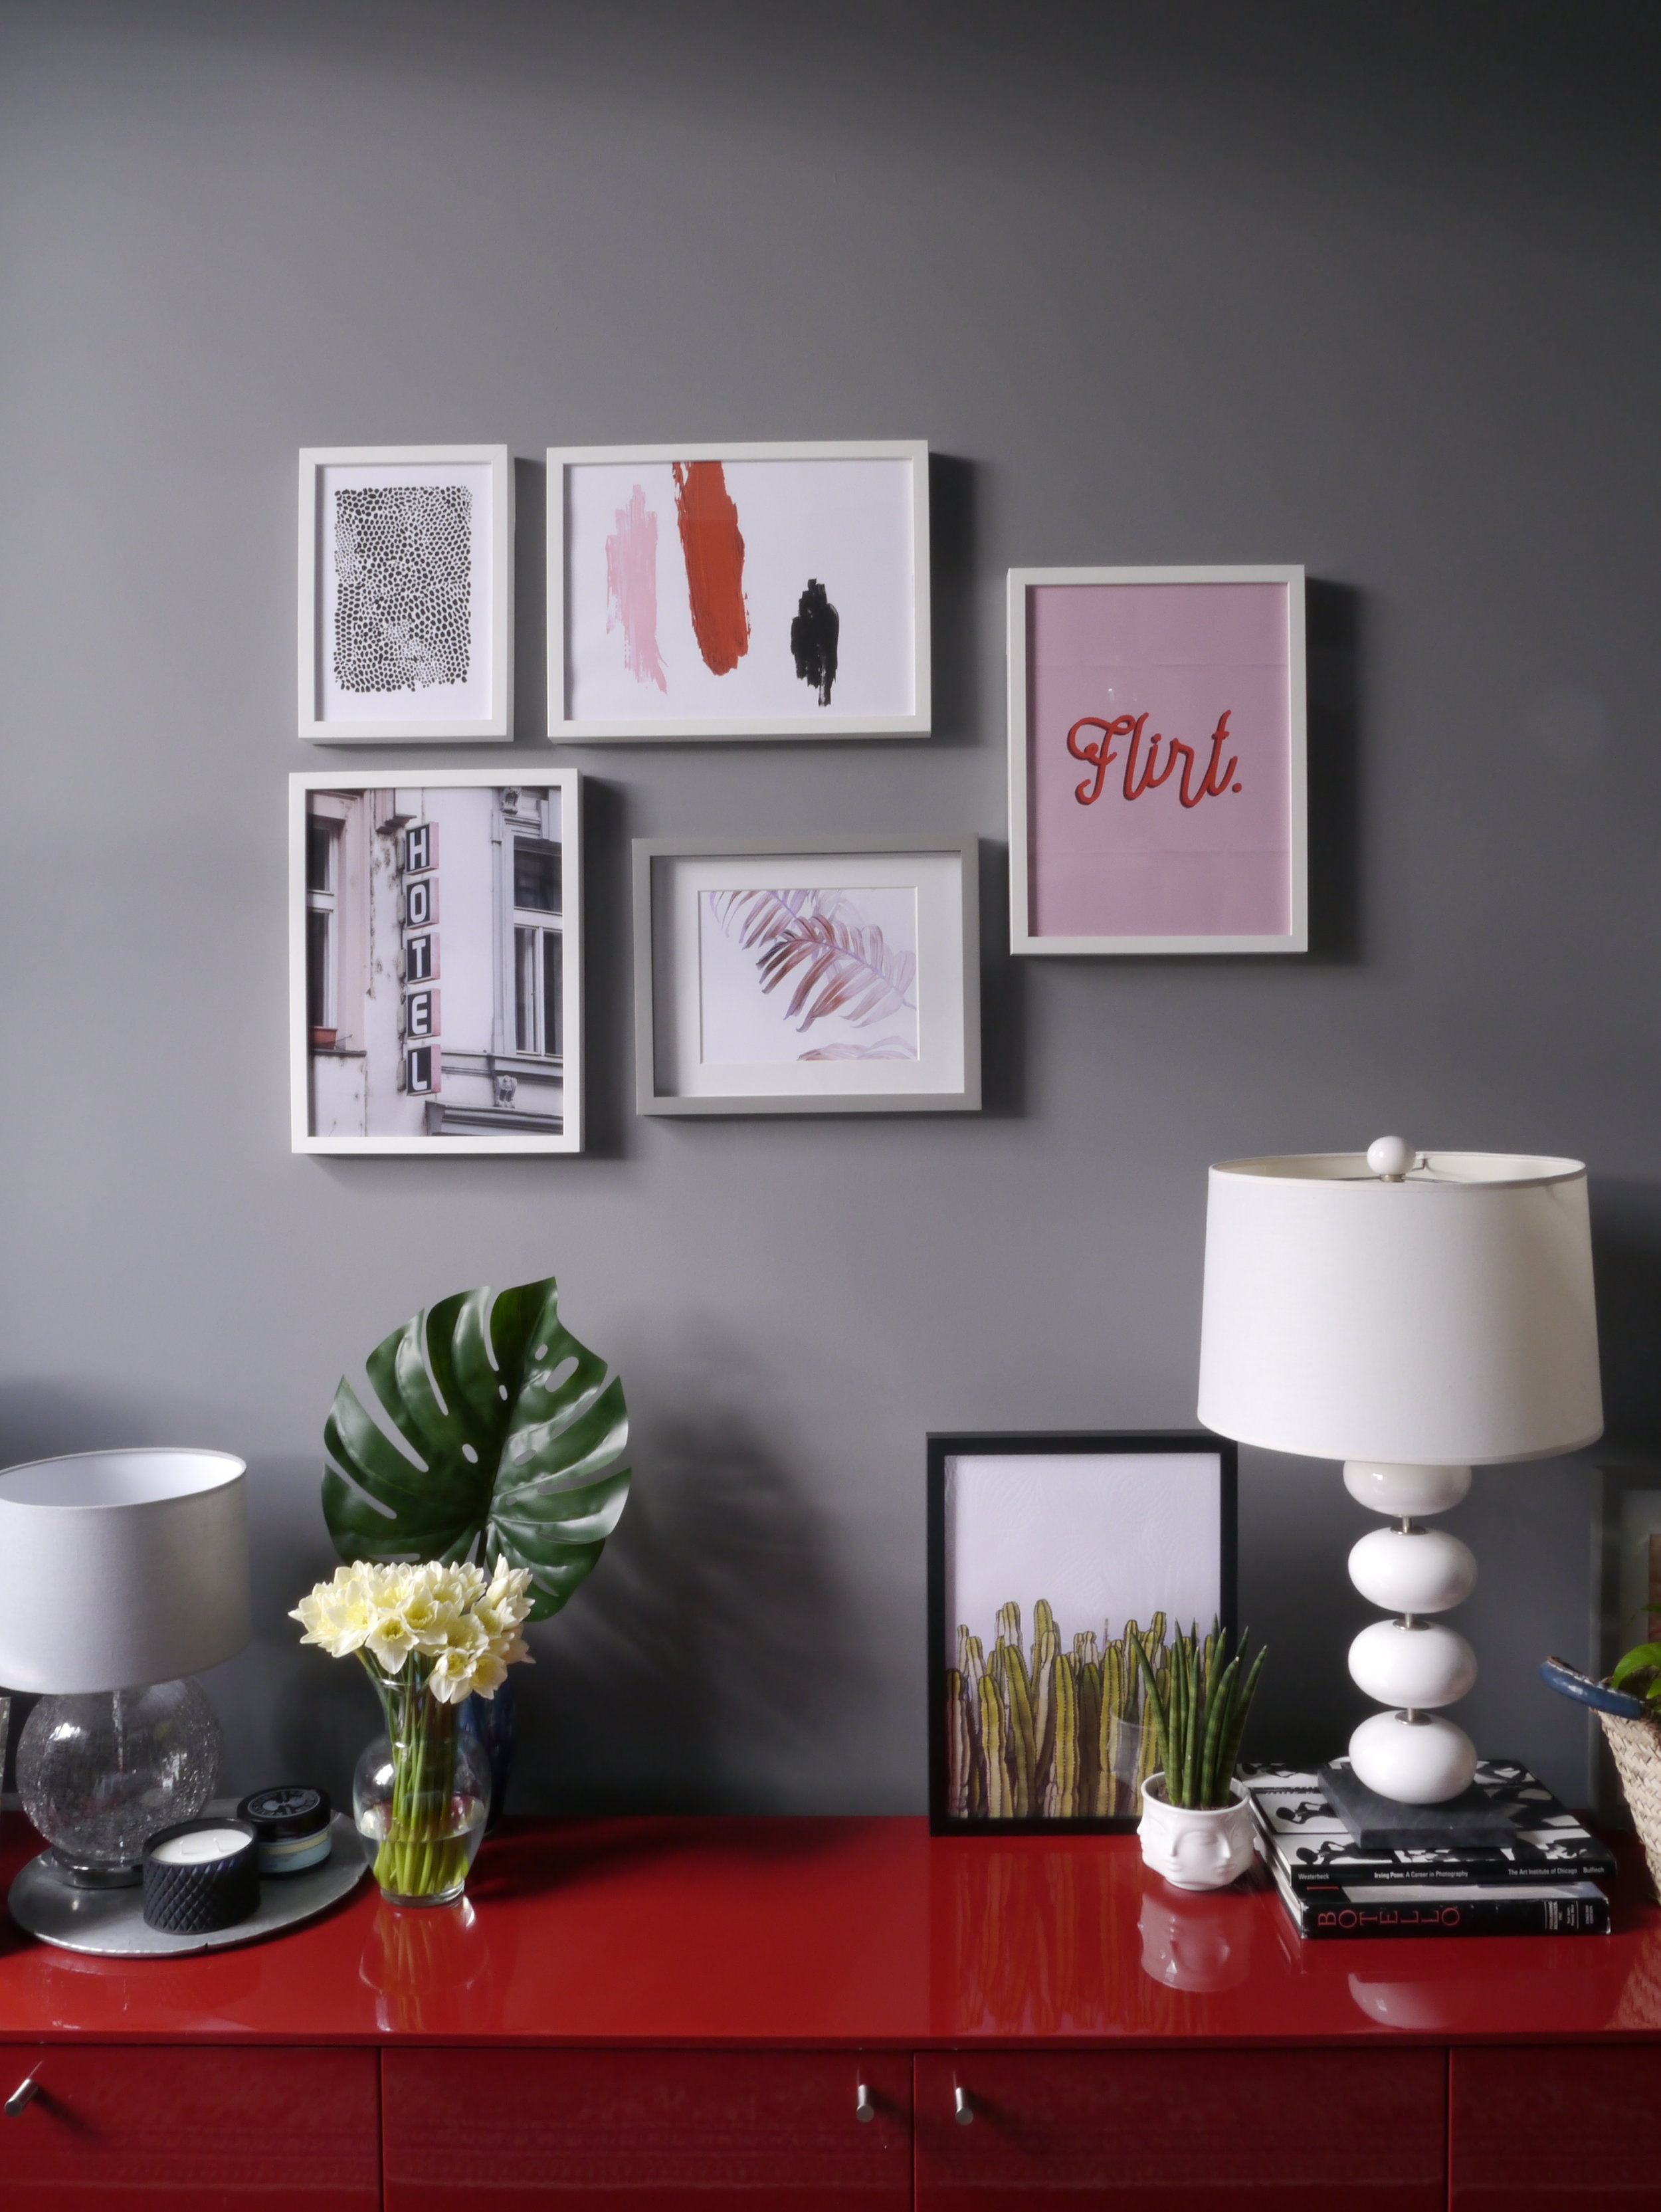 Liznylon_bedroom_gallerywall_pink_and_grey.JPG